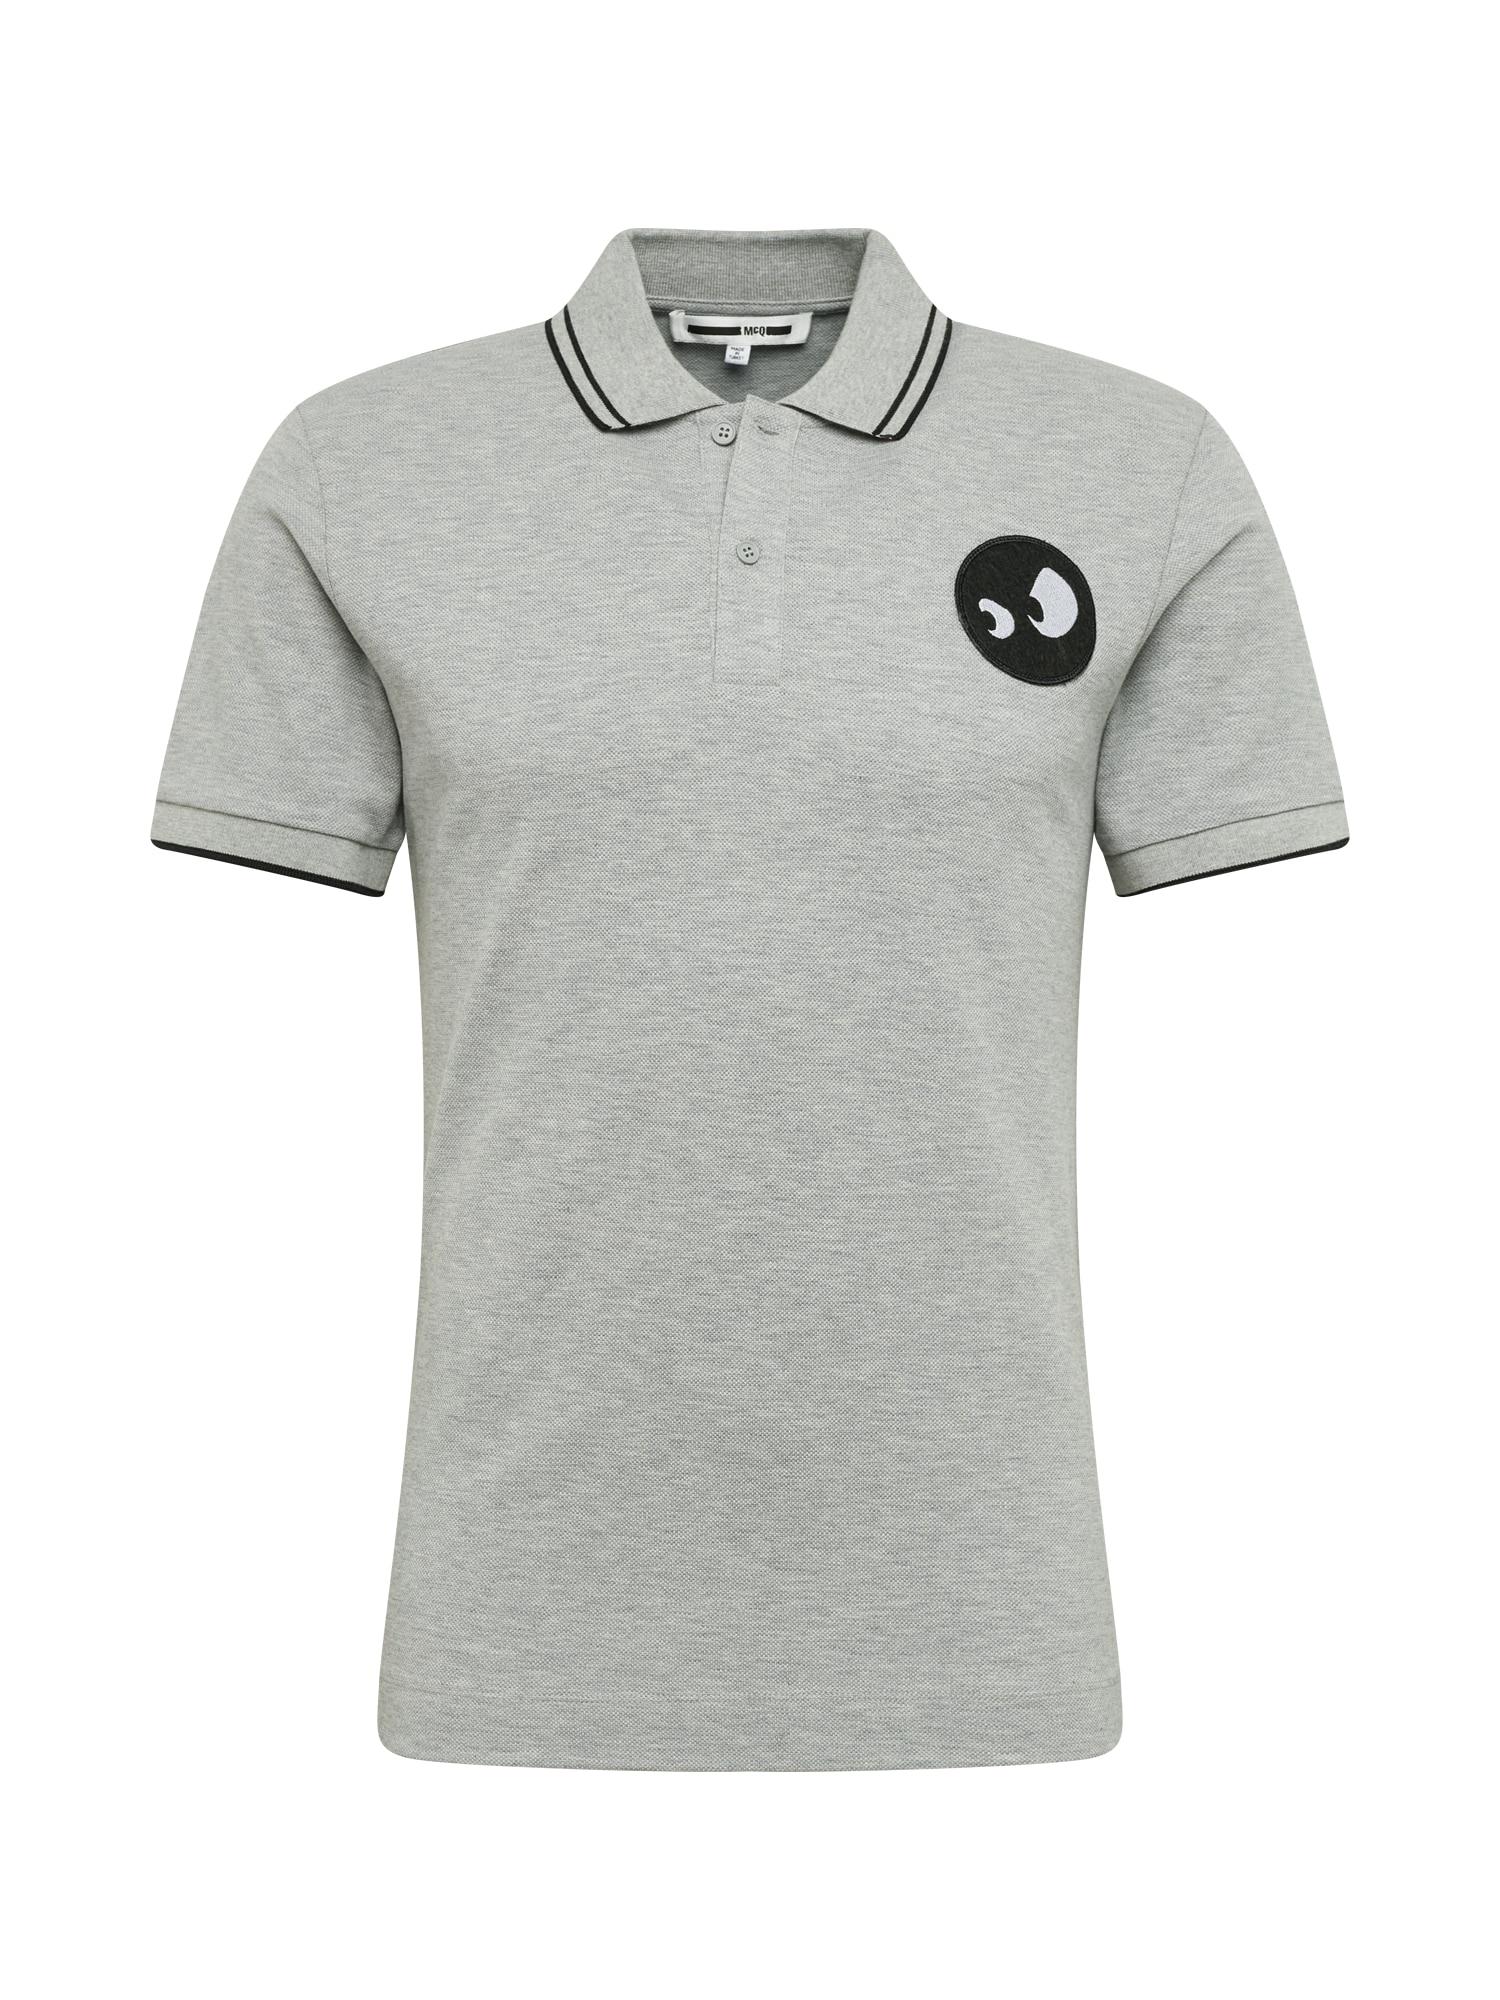 McQ Alexander McQueen Marškinėliai pilka / juoda / balta